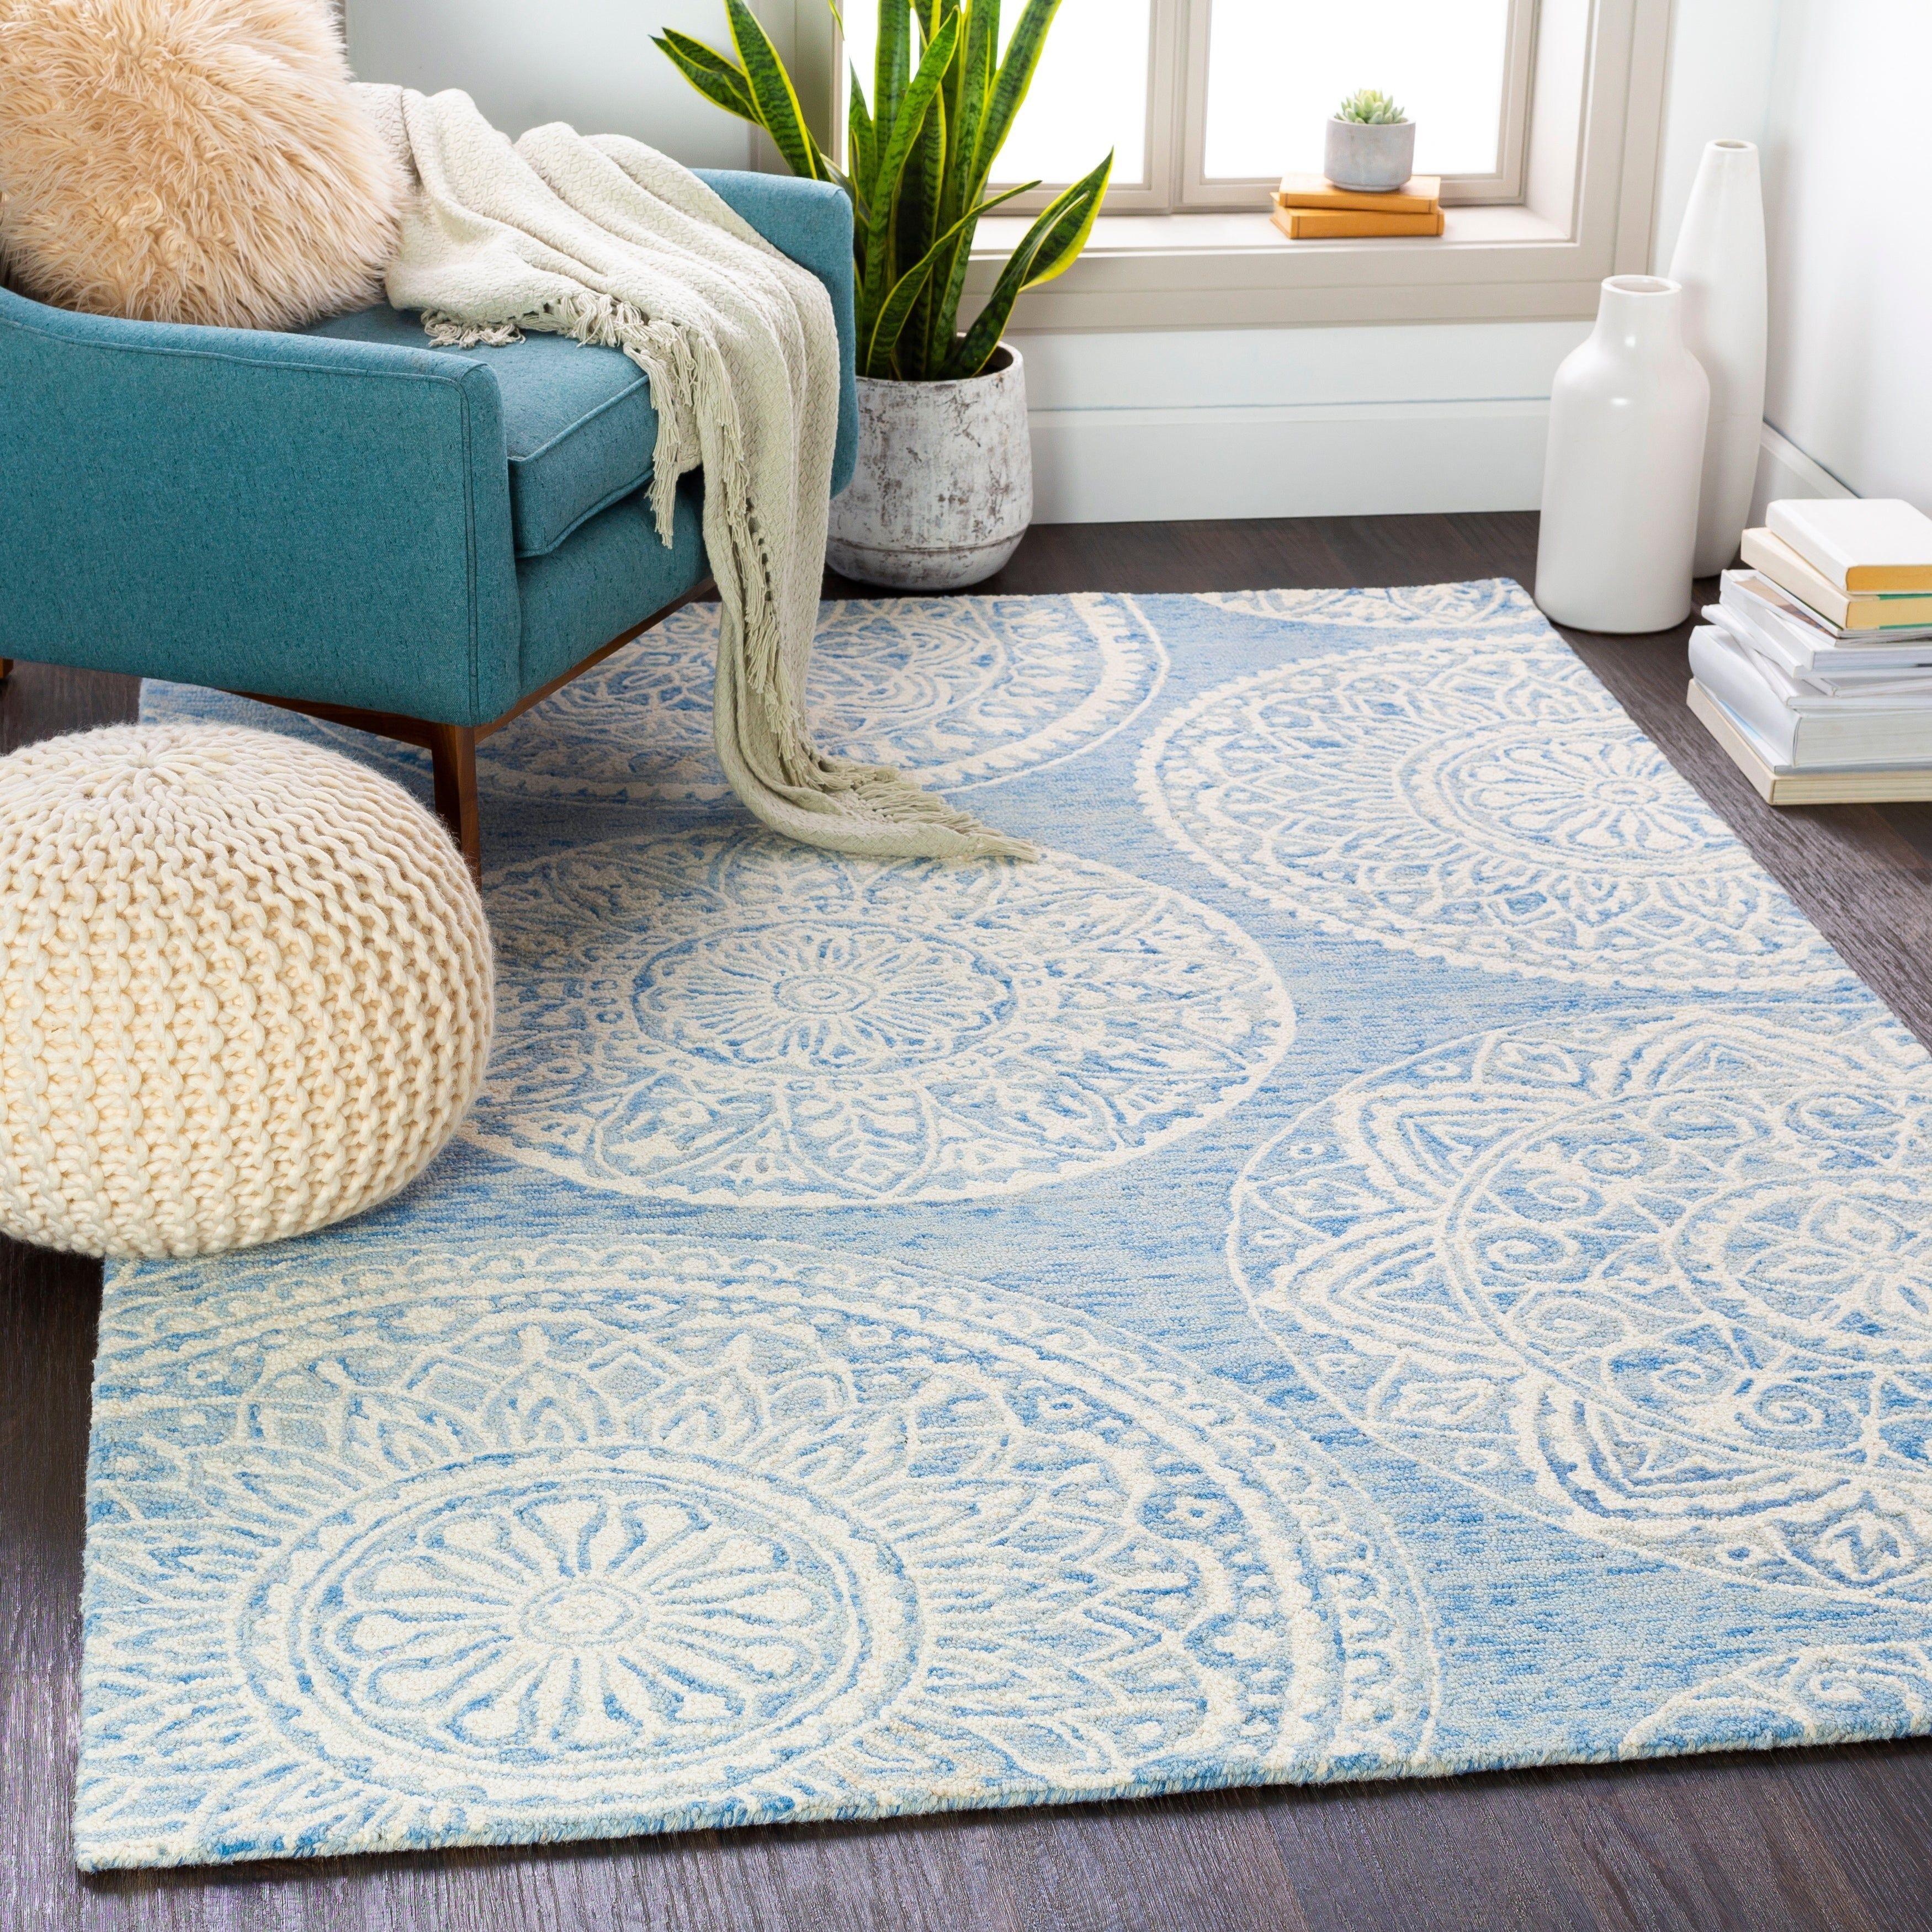 Pauleen Handmade Transitional Wool Area Rug Taupe 6 X 9